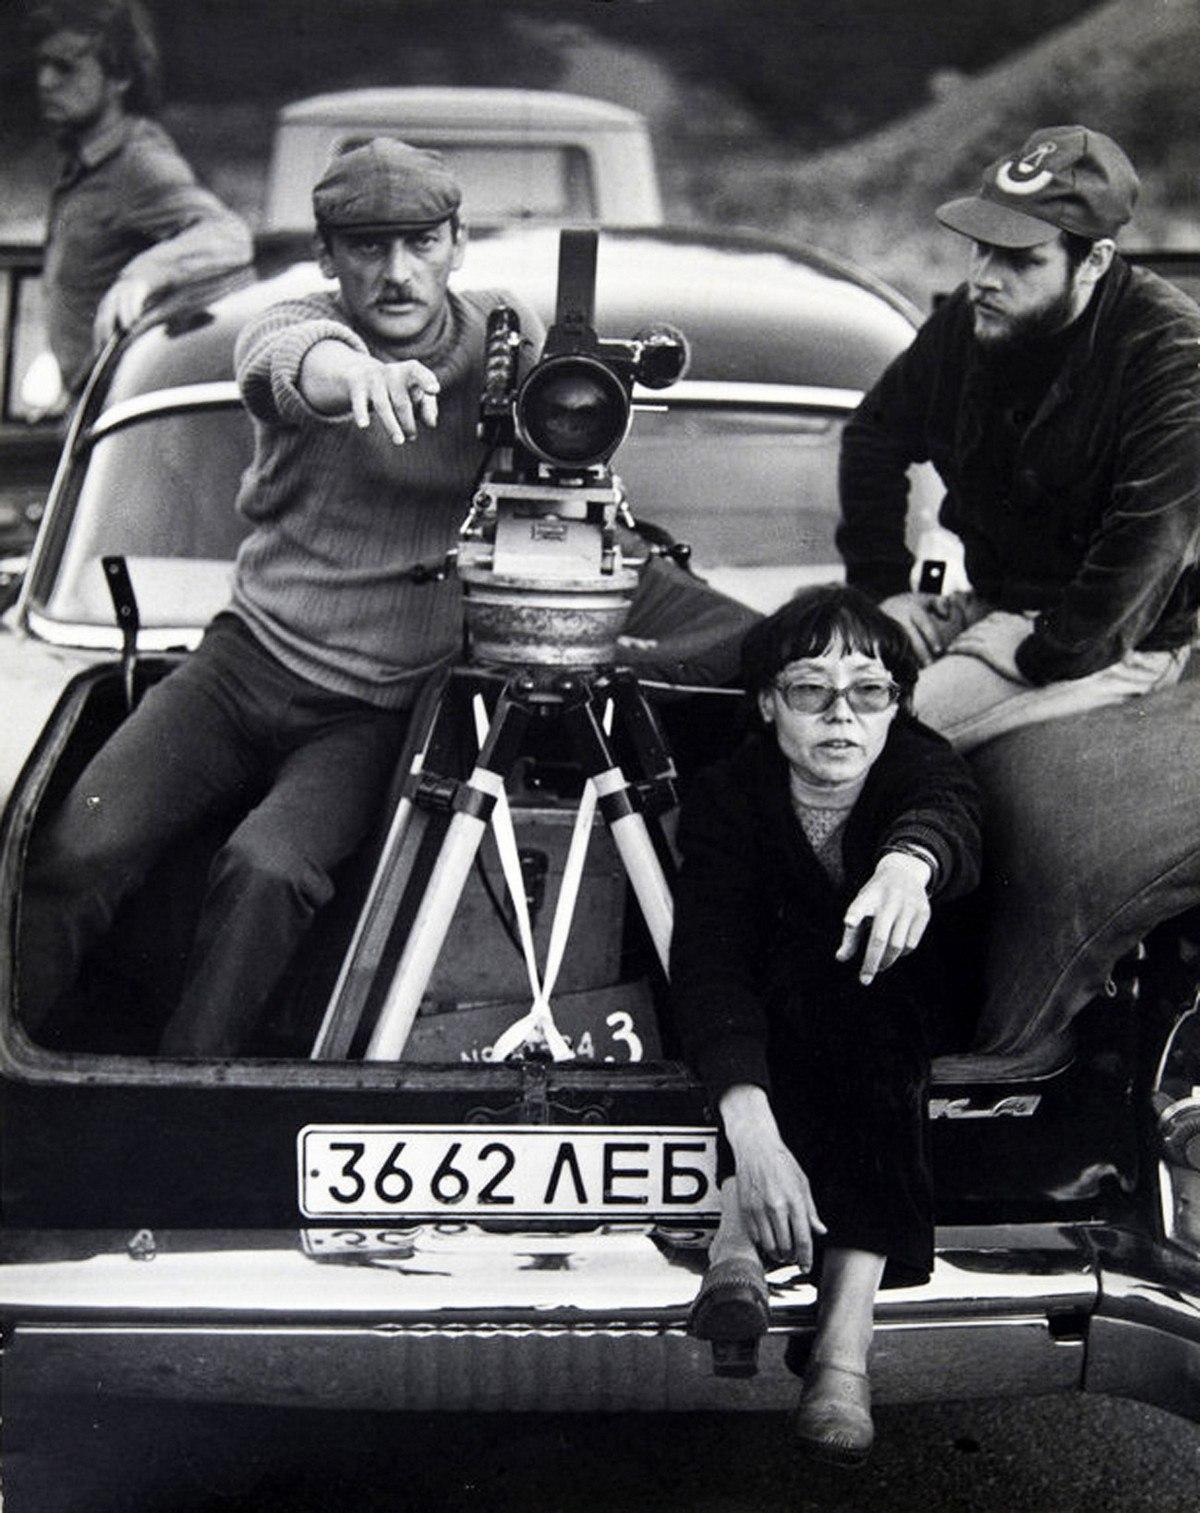 1982. Юрий Векслер, режиссёр Динара Асанова. Со съёмок фильма «Пацаны»,